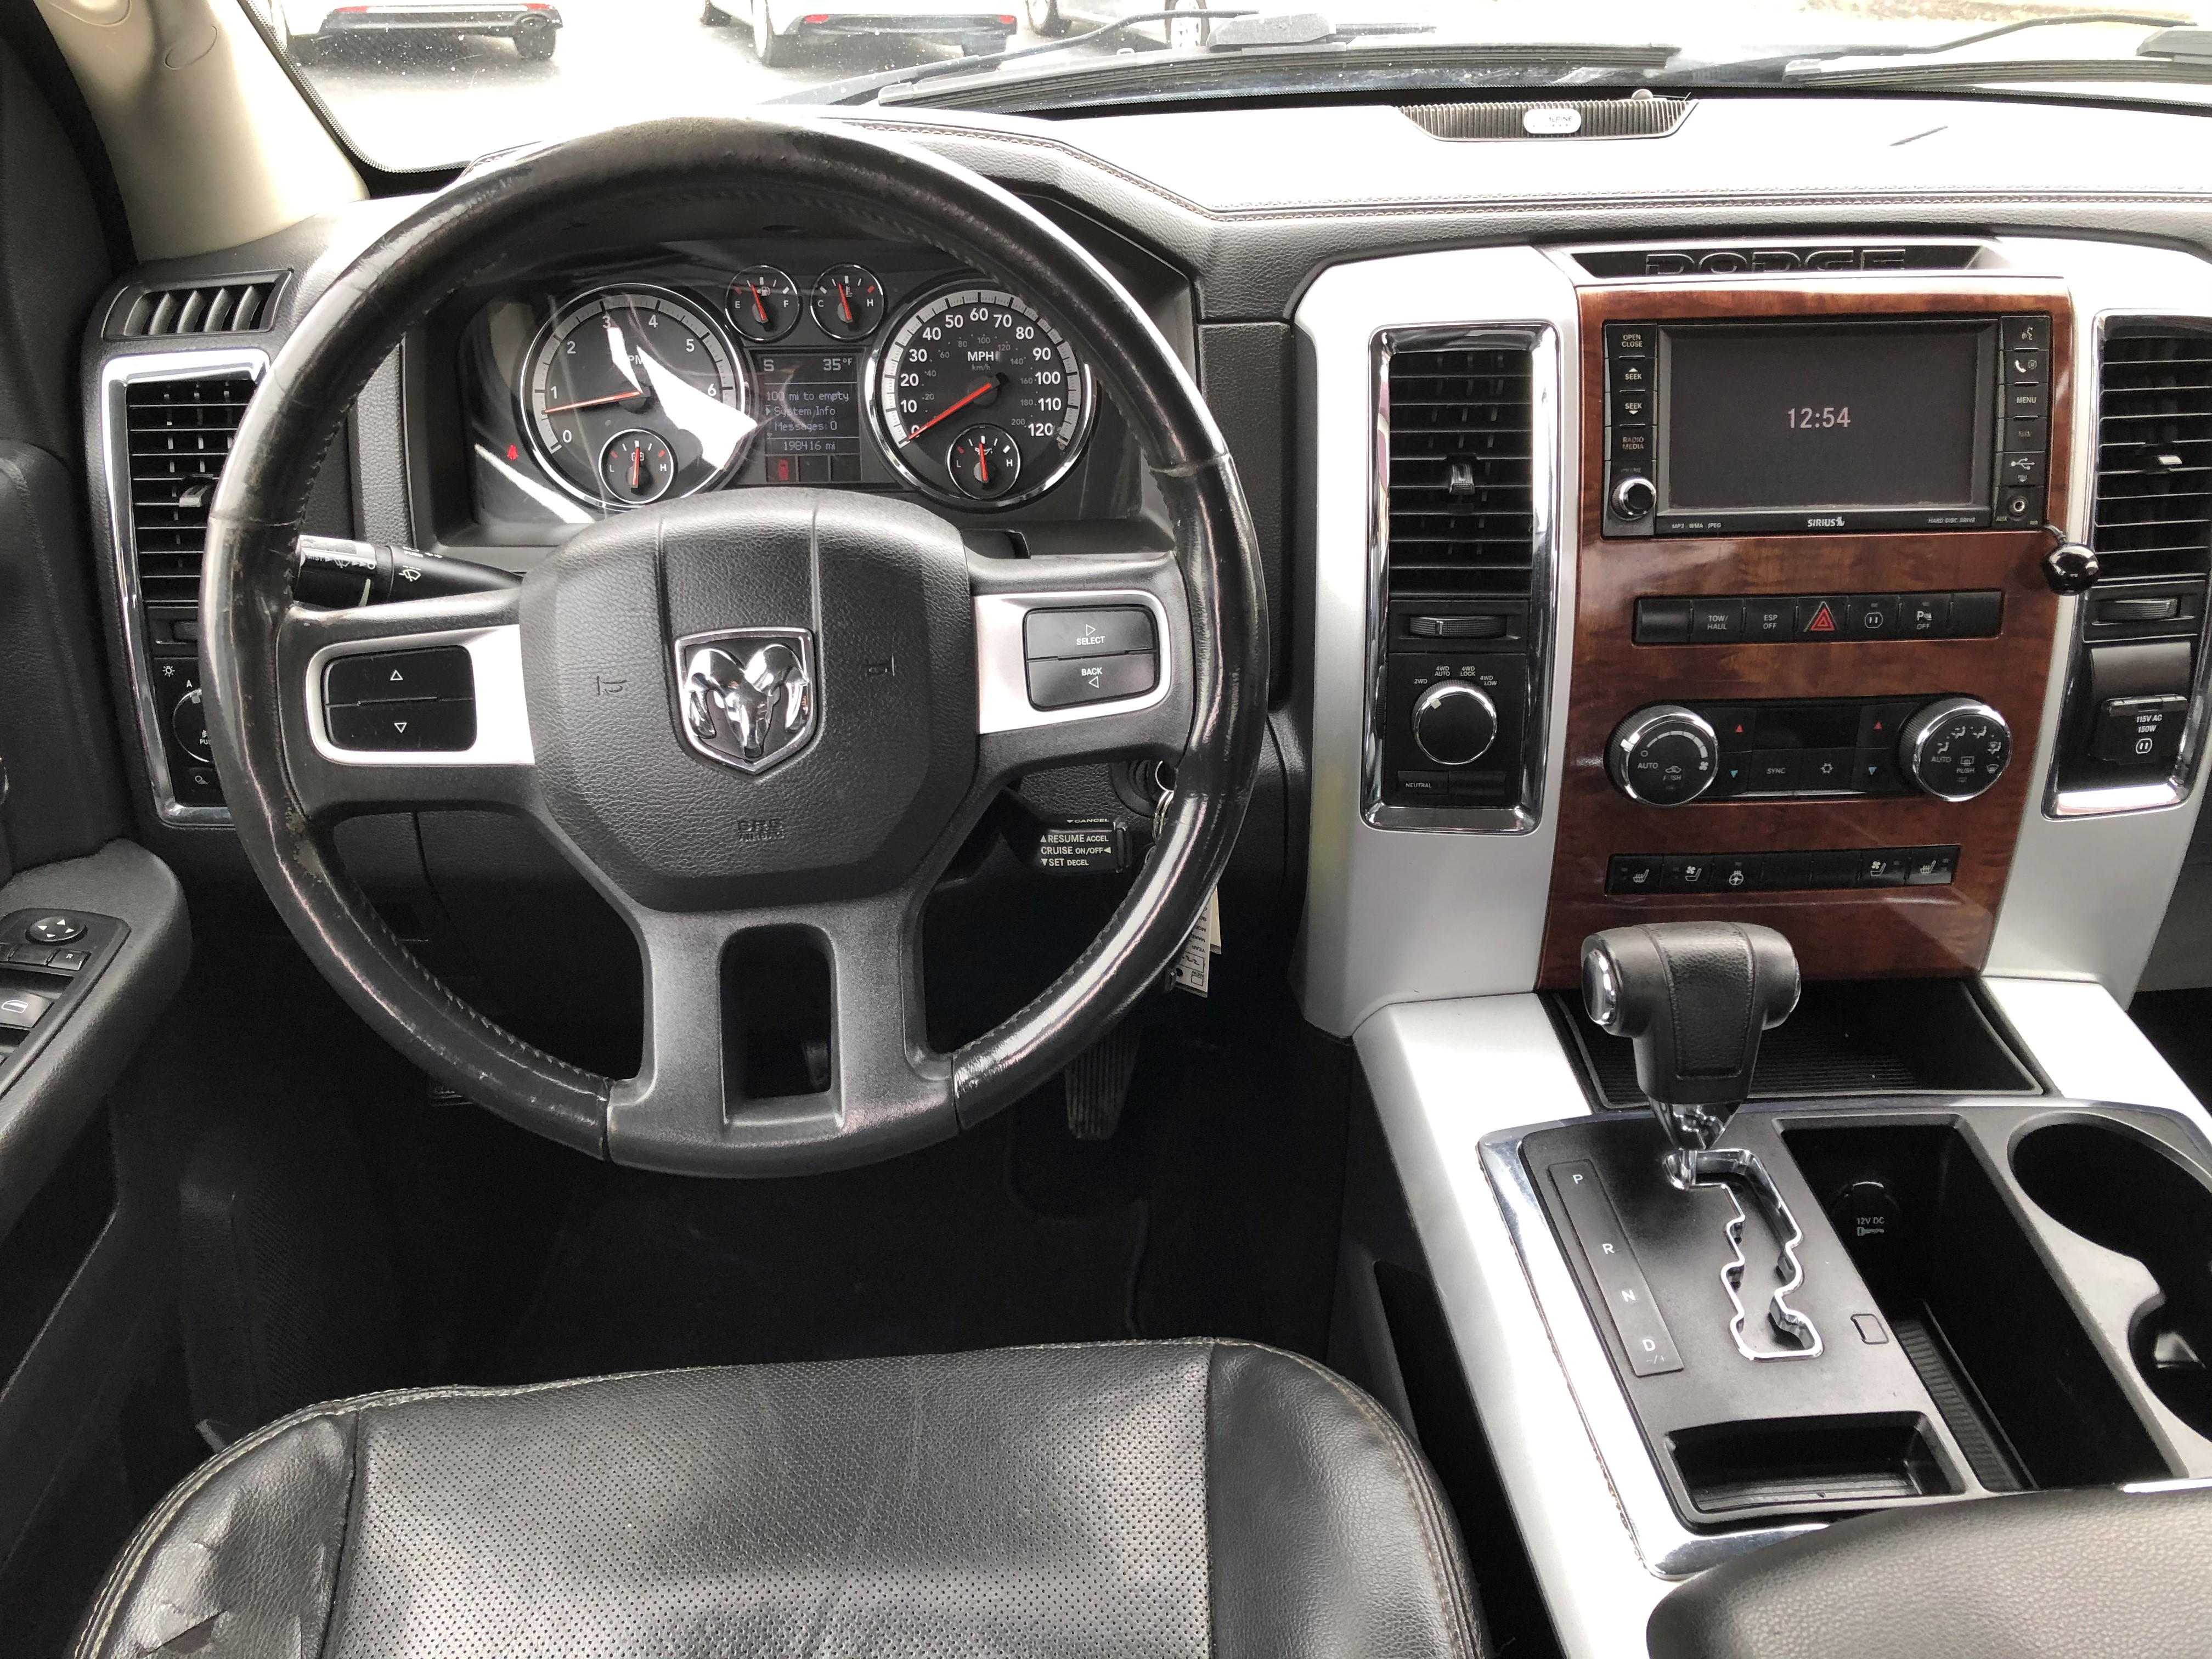 used vehicle - Truck Dodge Ram 1500 2009